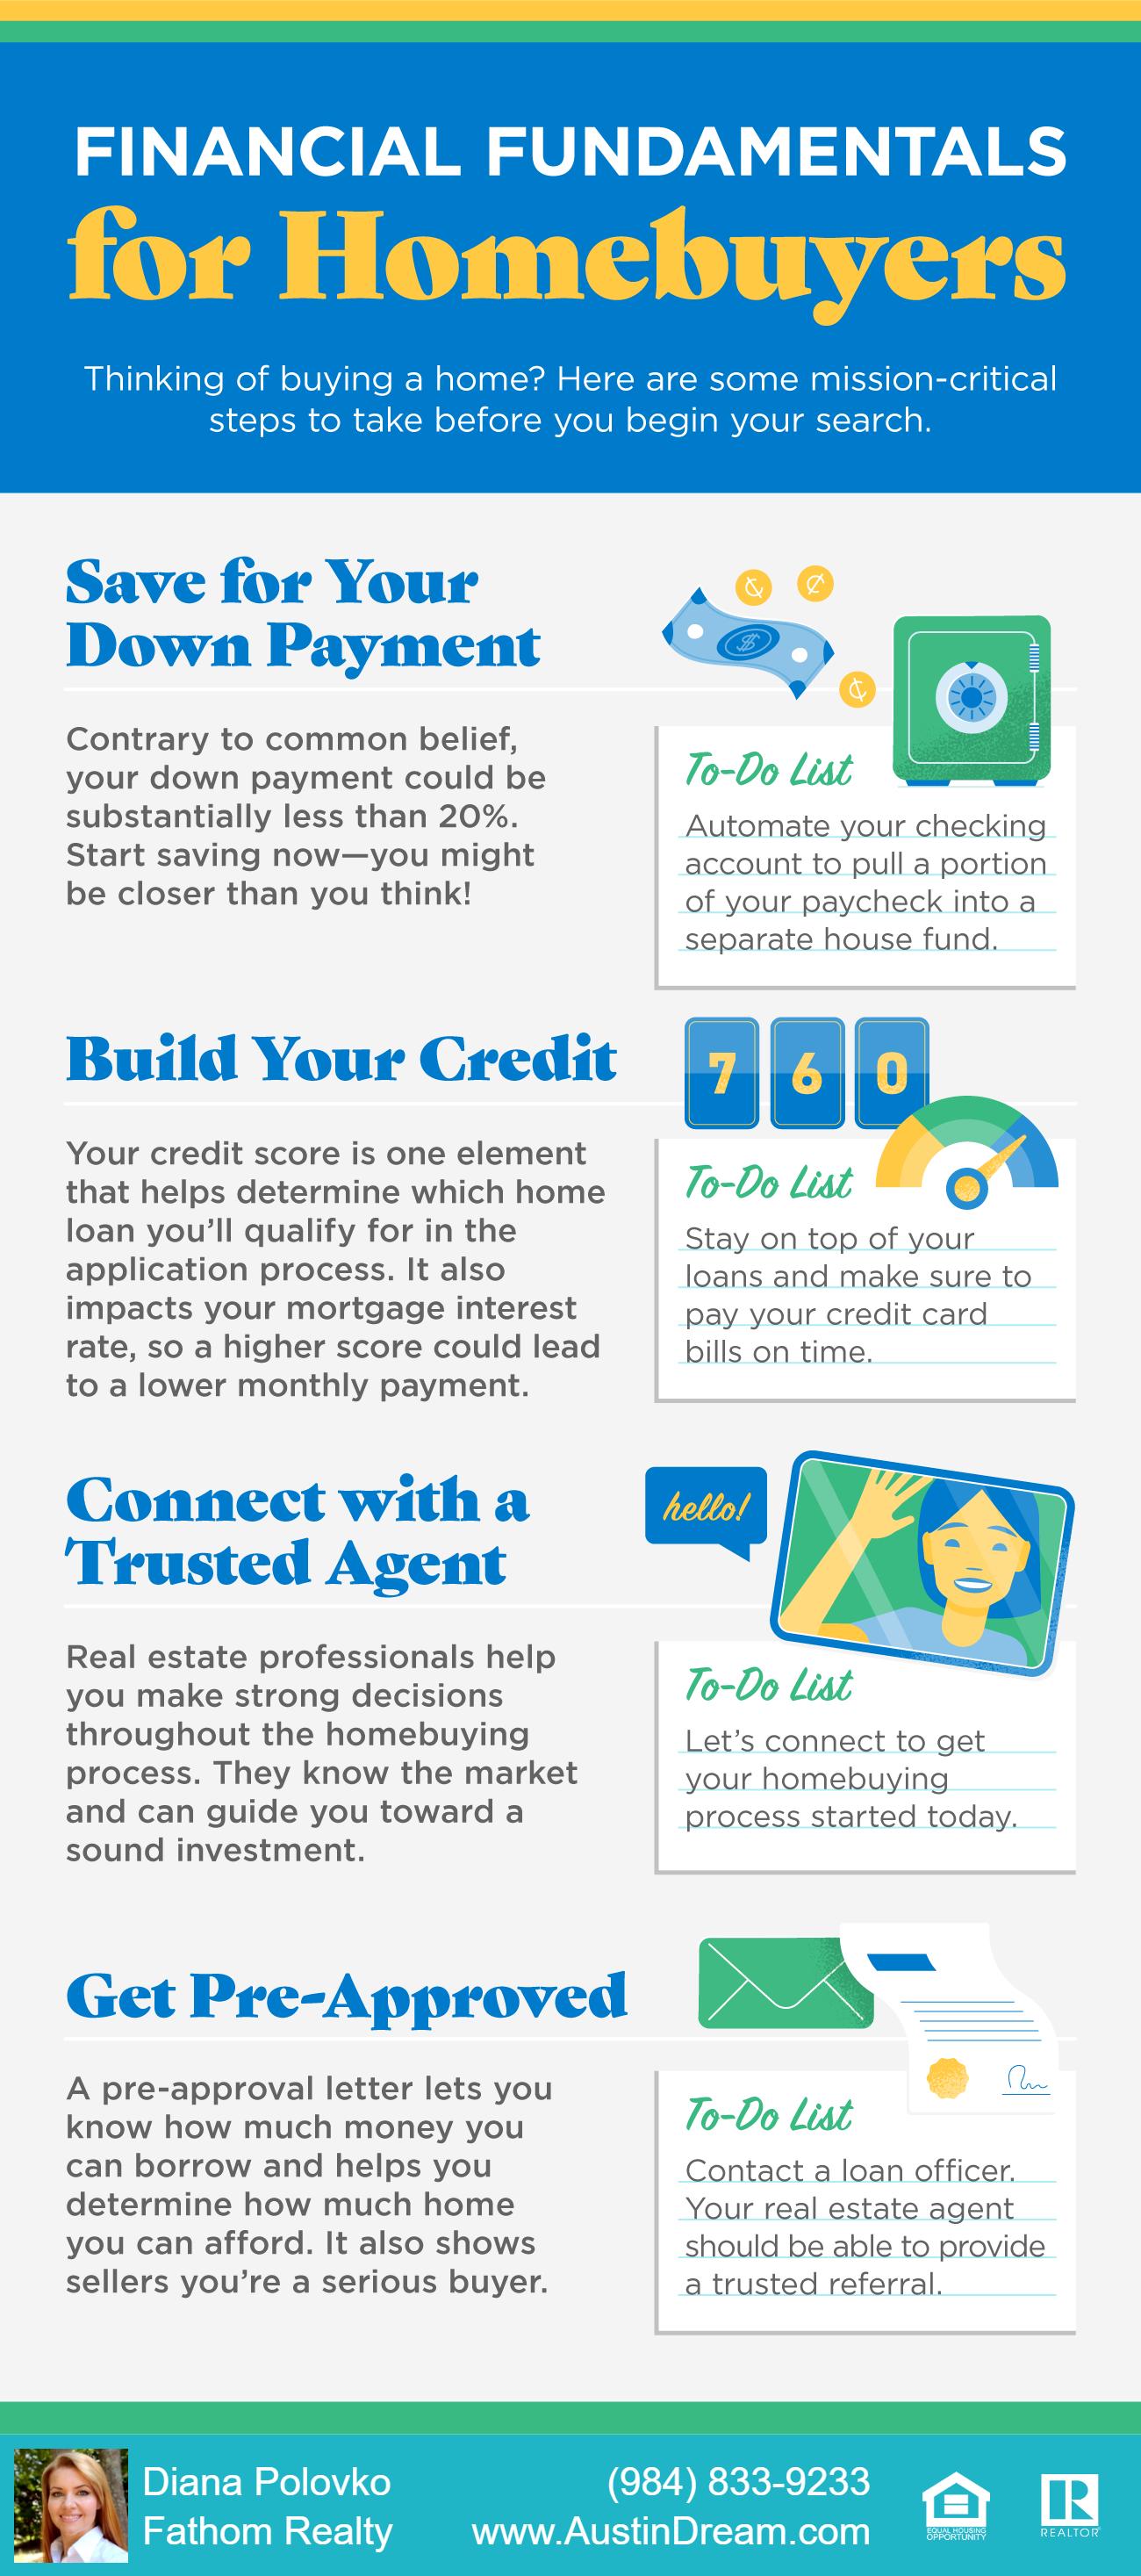 Financial fundamentals for homebuyers Diana Polovko, Realtor, Fathom Realty